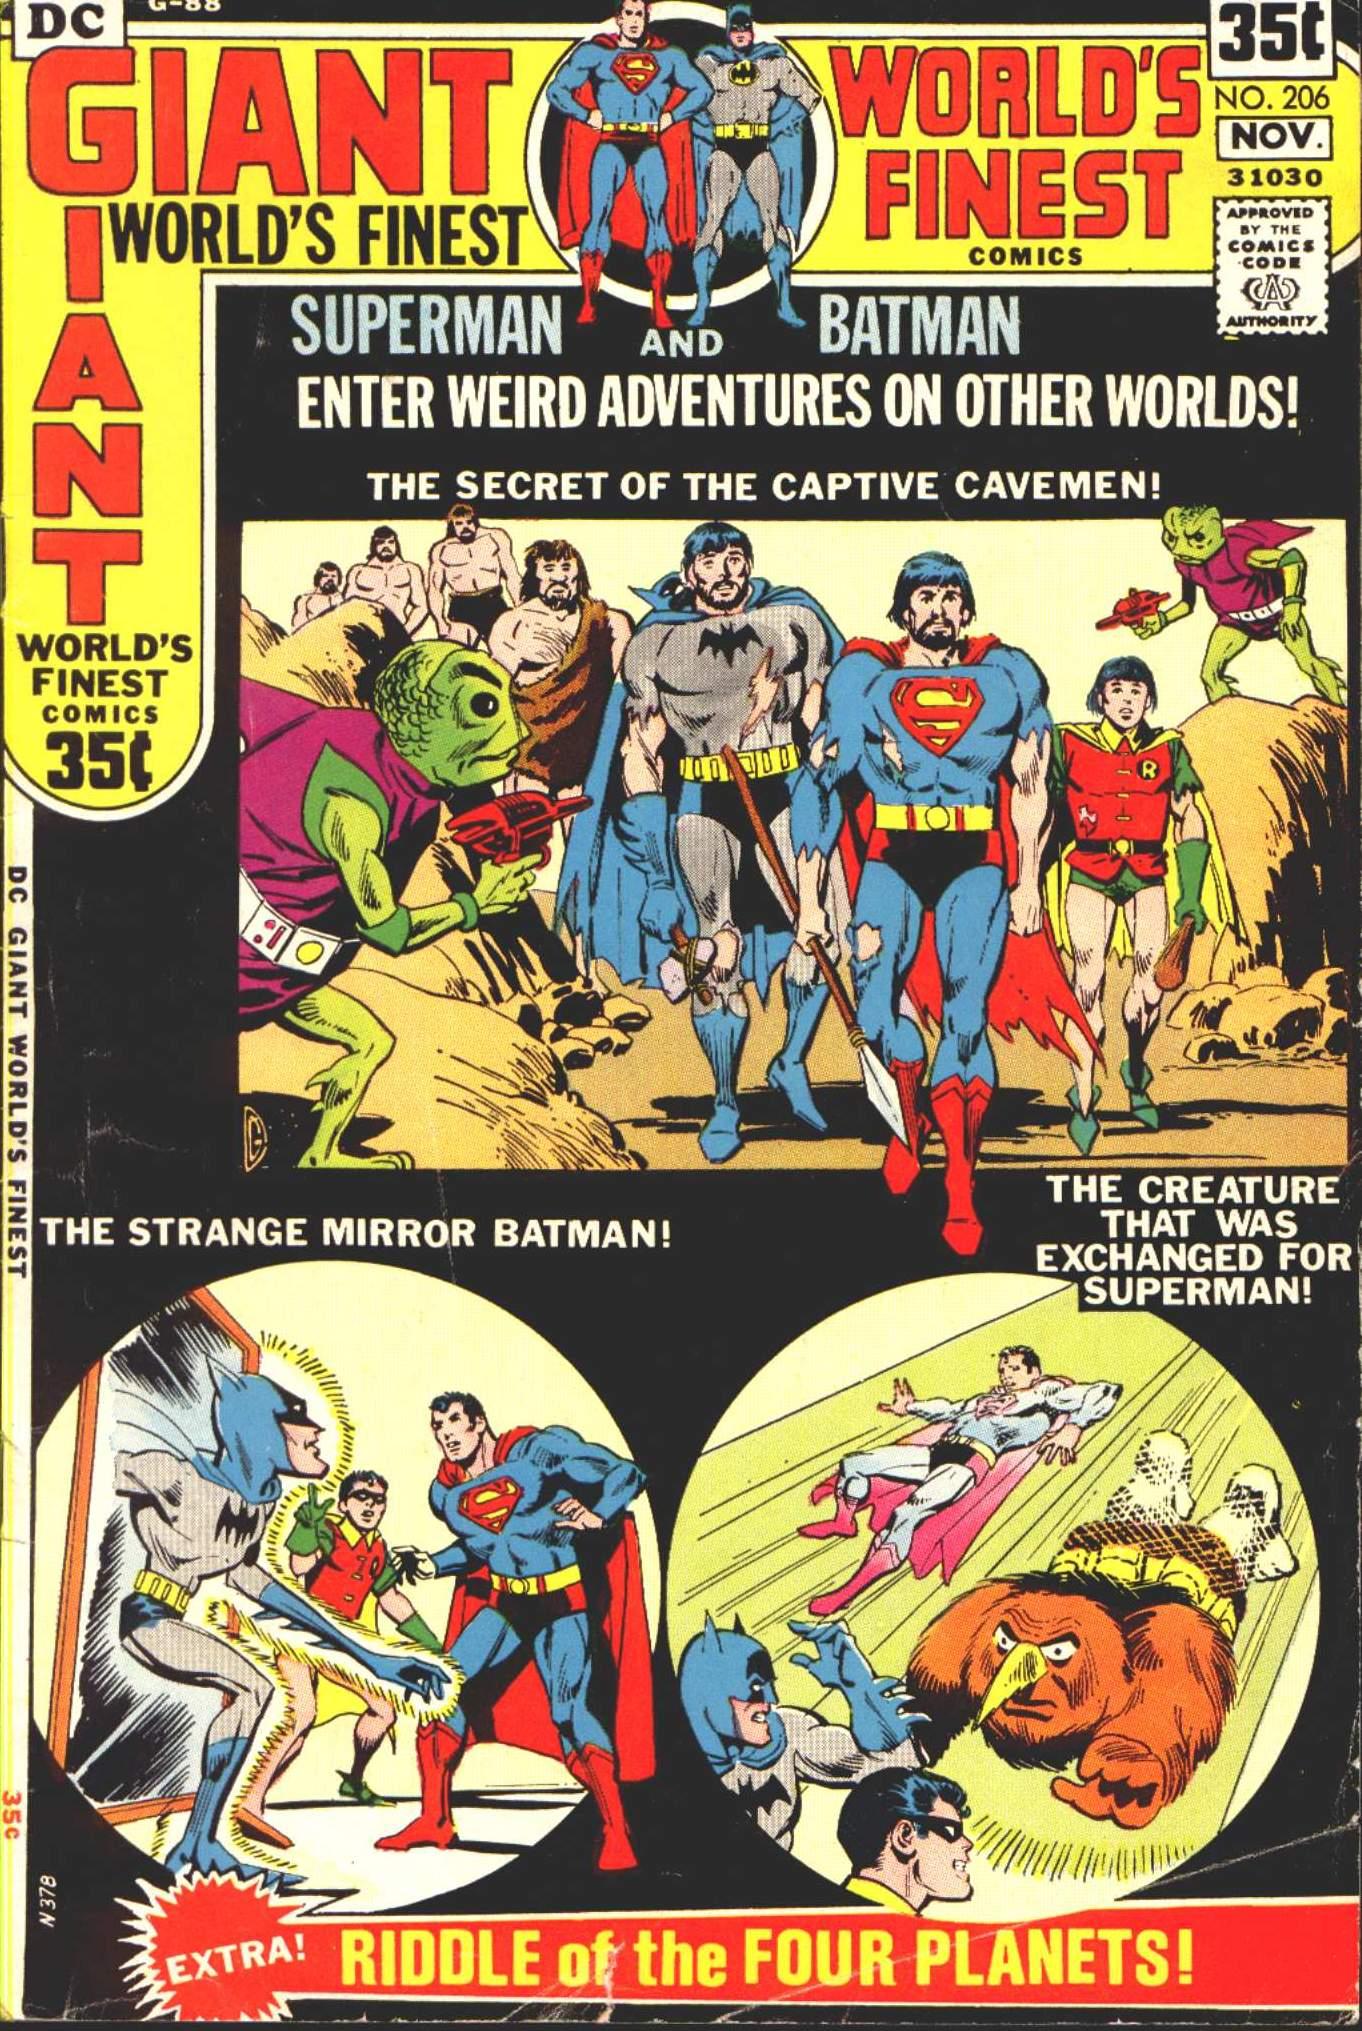 Read online World's Finest Comics comic -  Issue #206 - 1